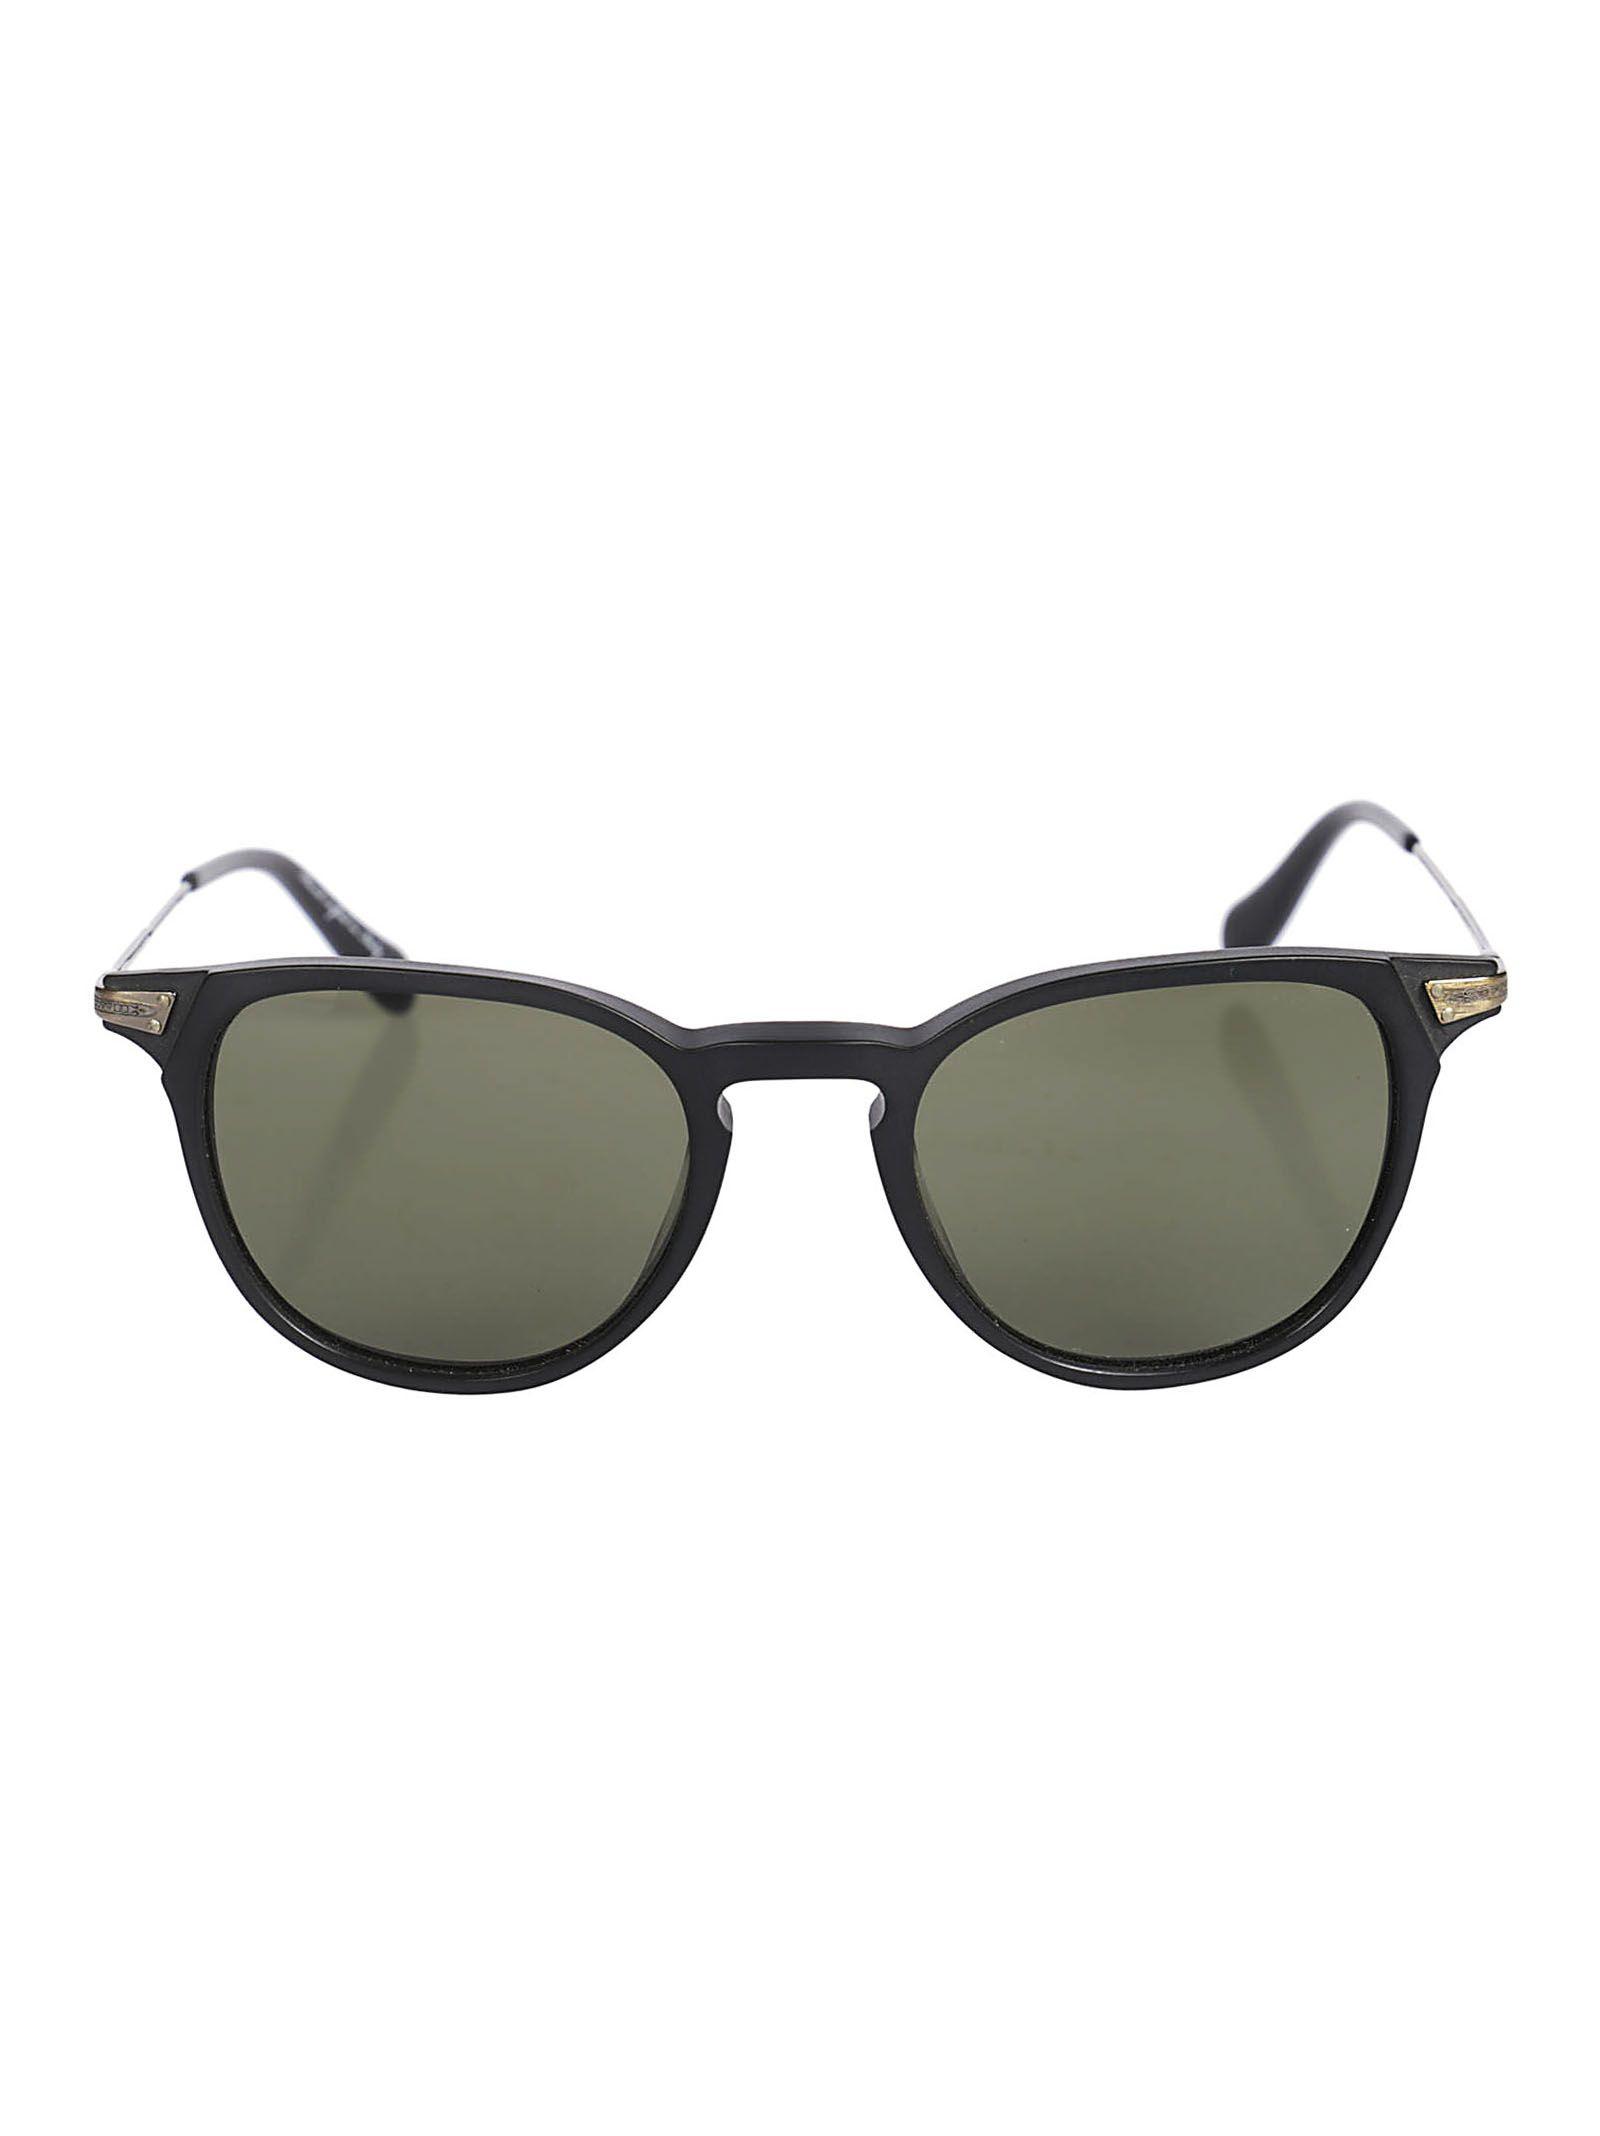 Oliver Peoples Ennis Sunglasses